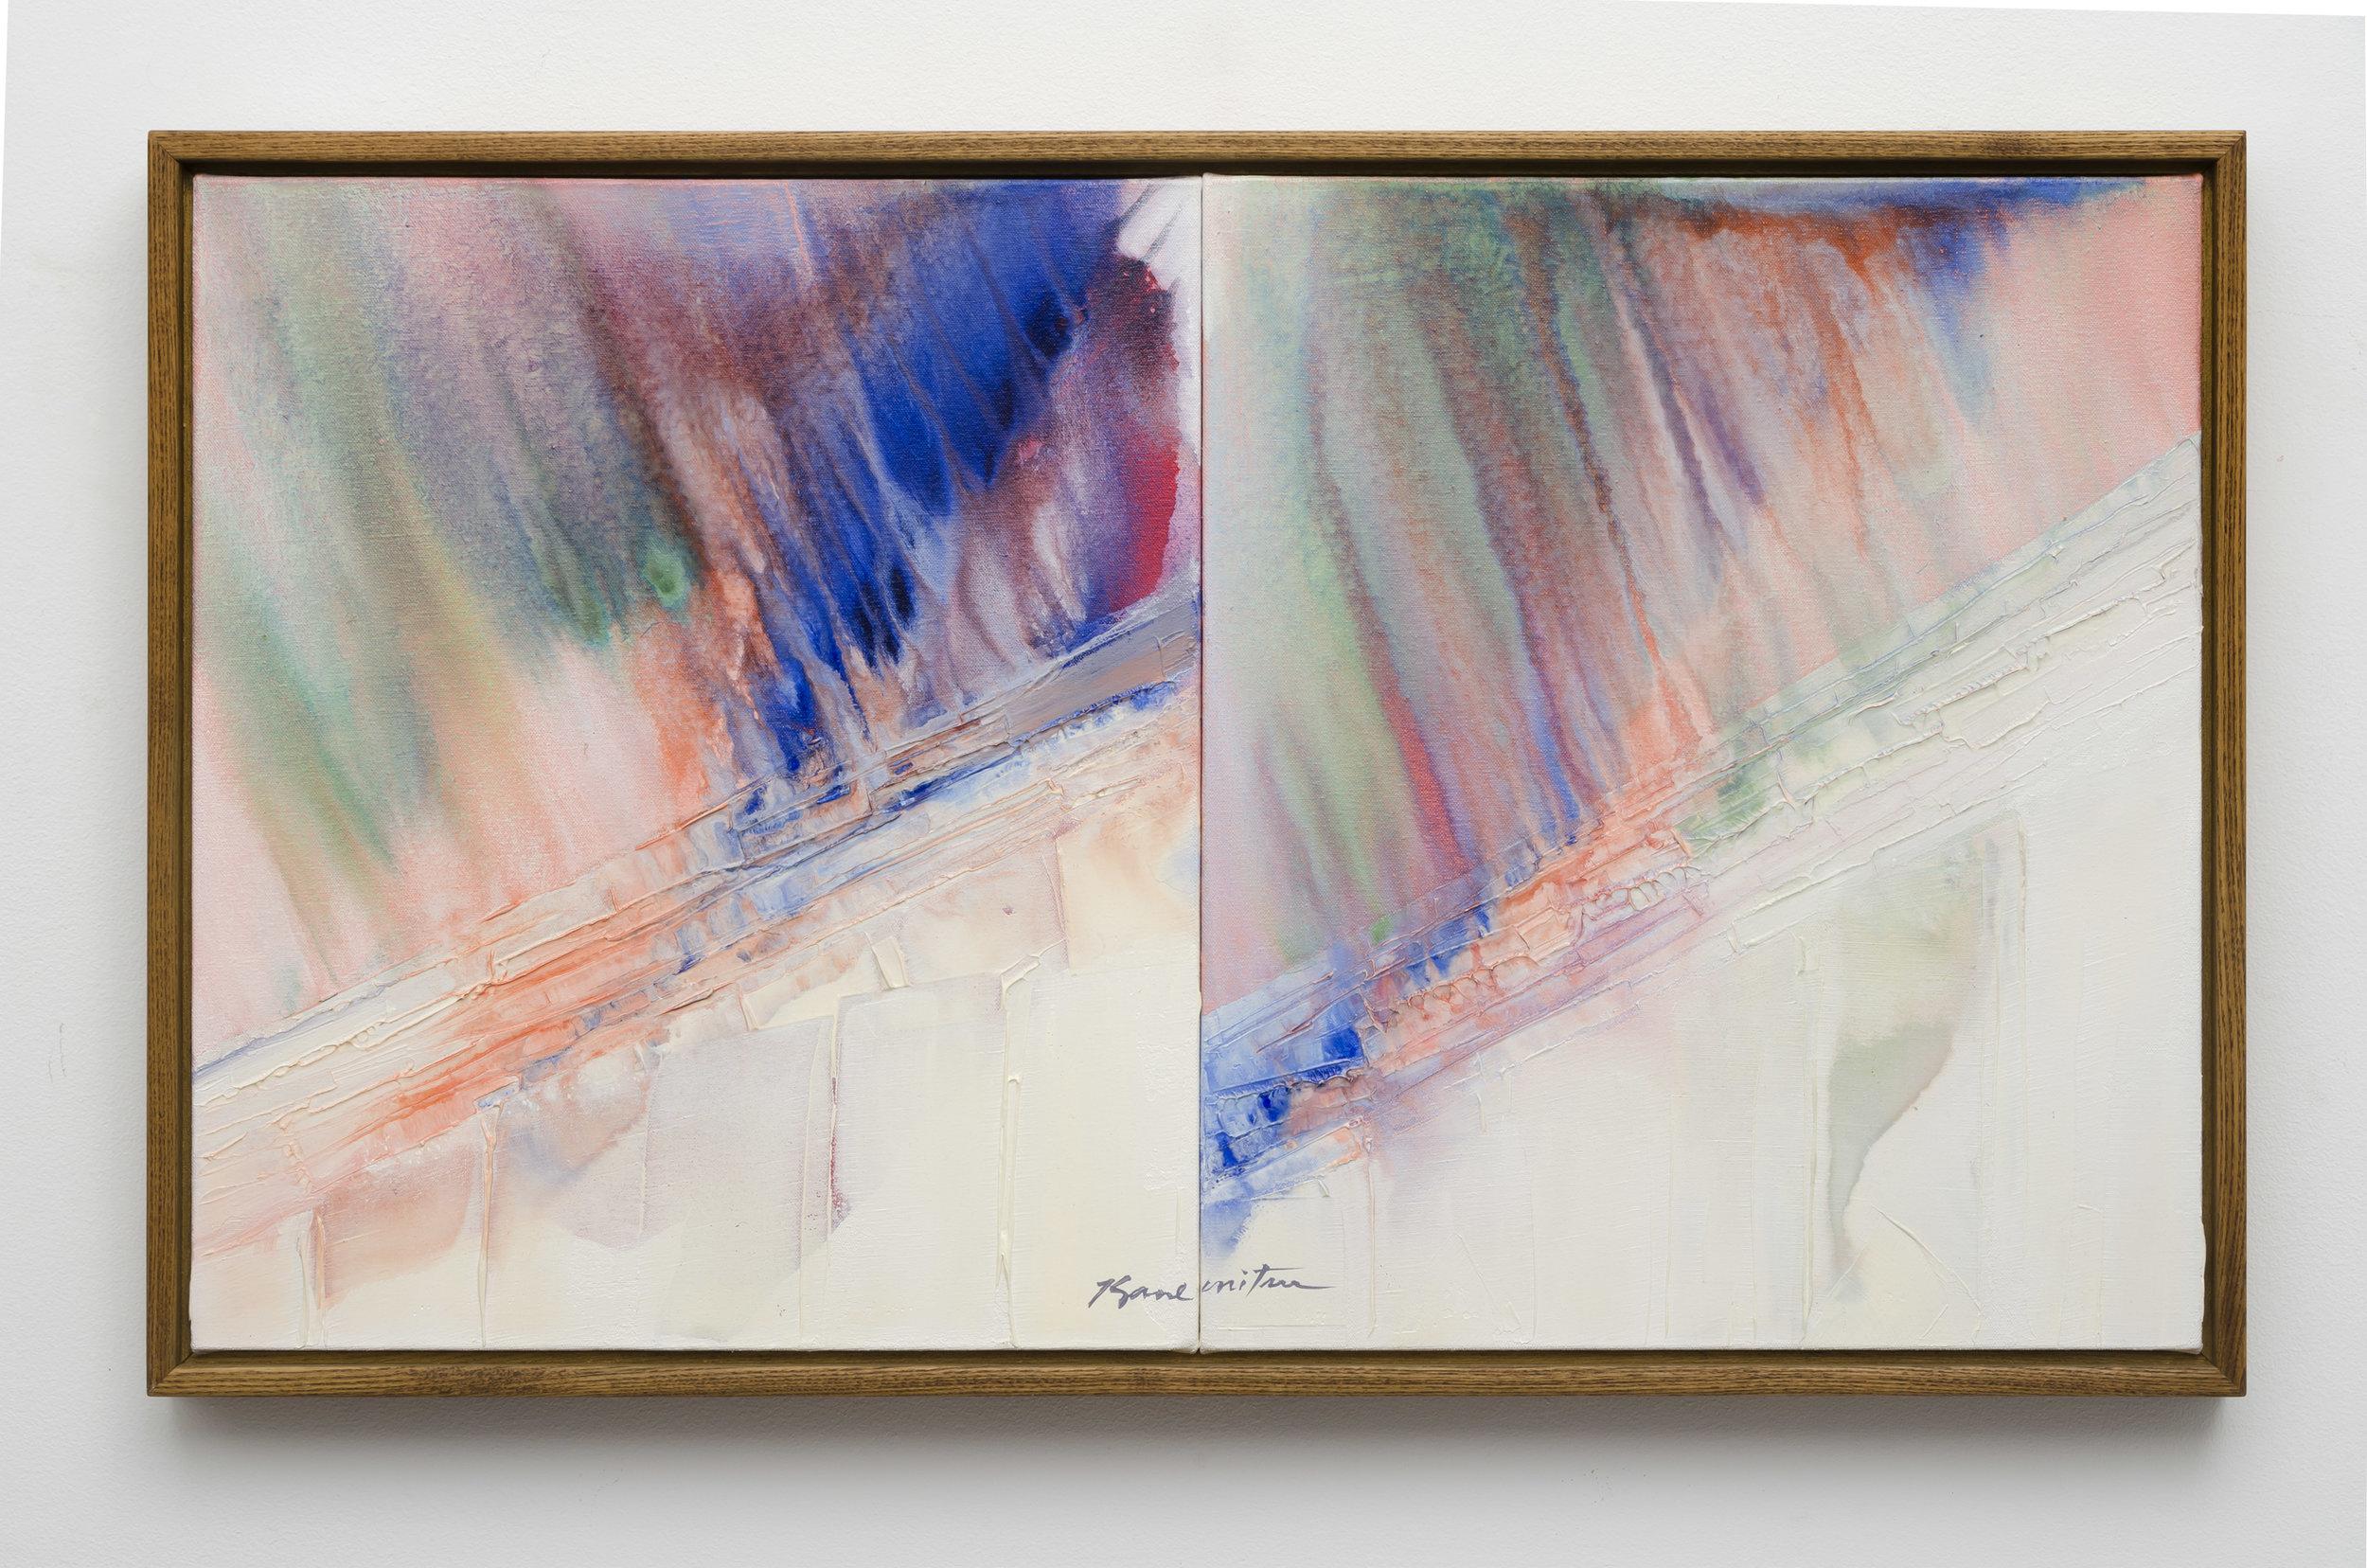 Summer Rain , 1988 acrylic on canvas 22.75 x 37.75 inches;, 57.8 x 95.9 centimeters